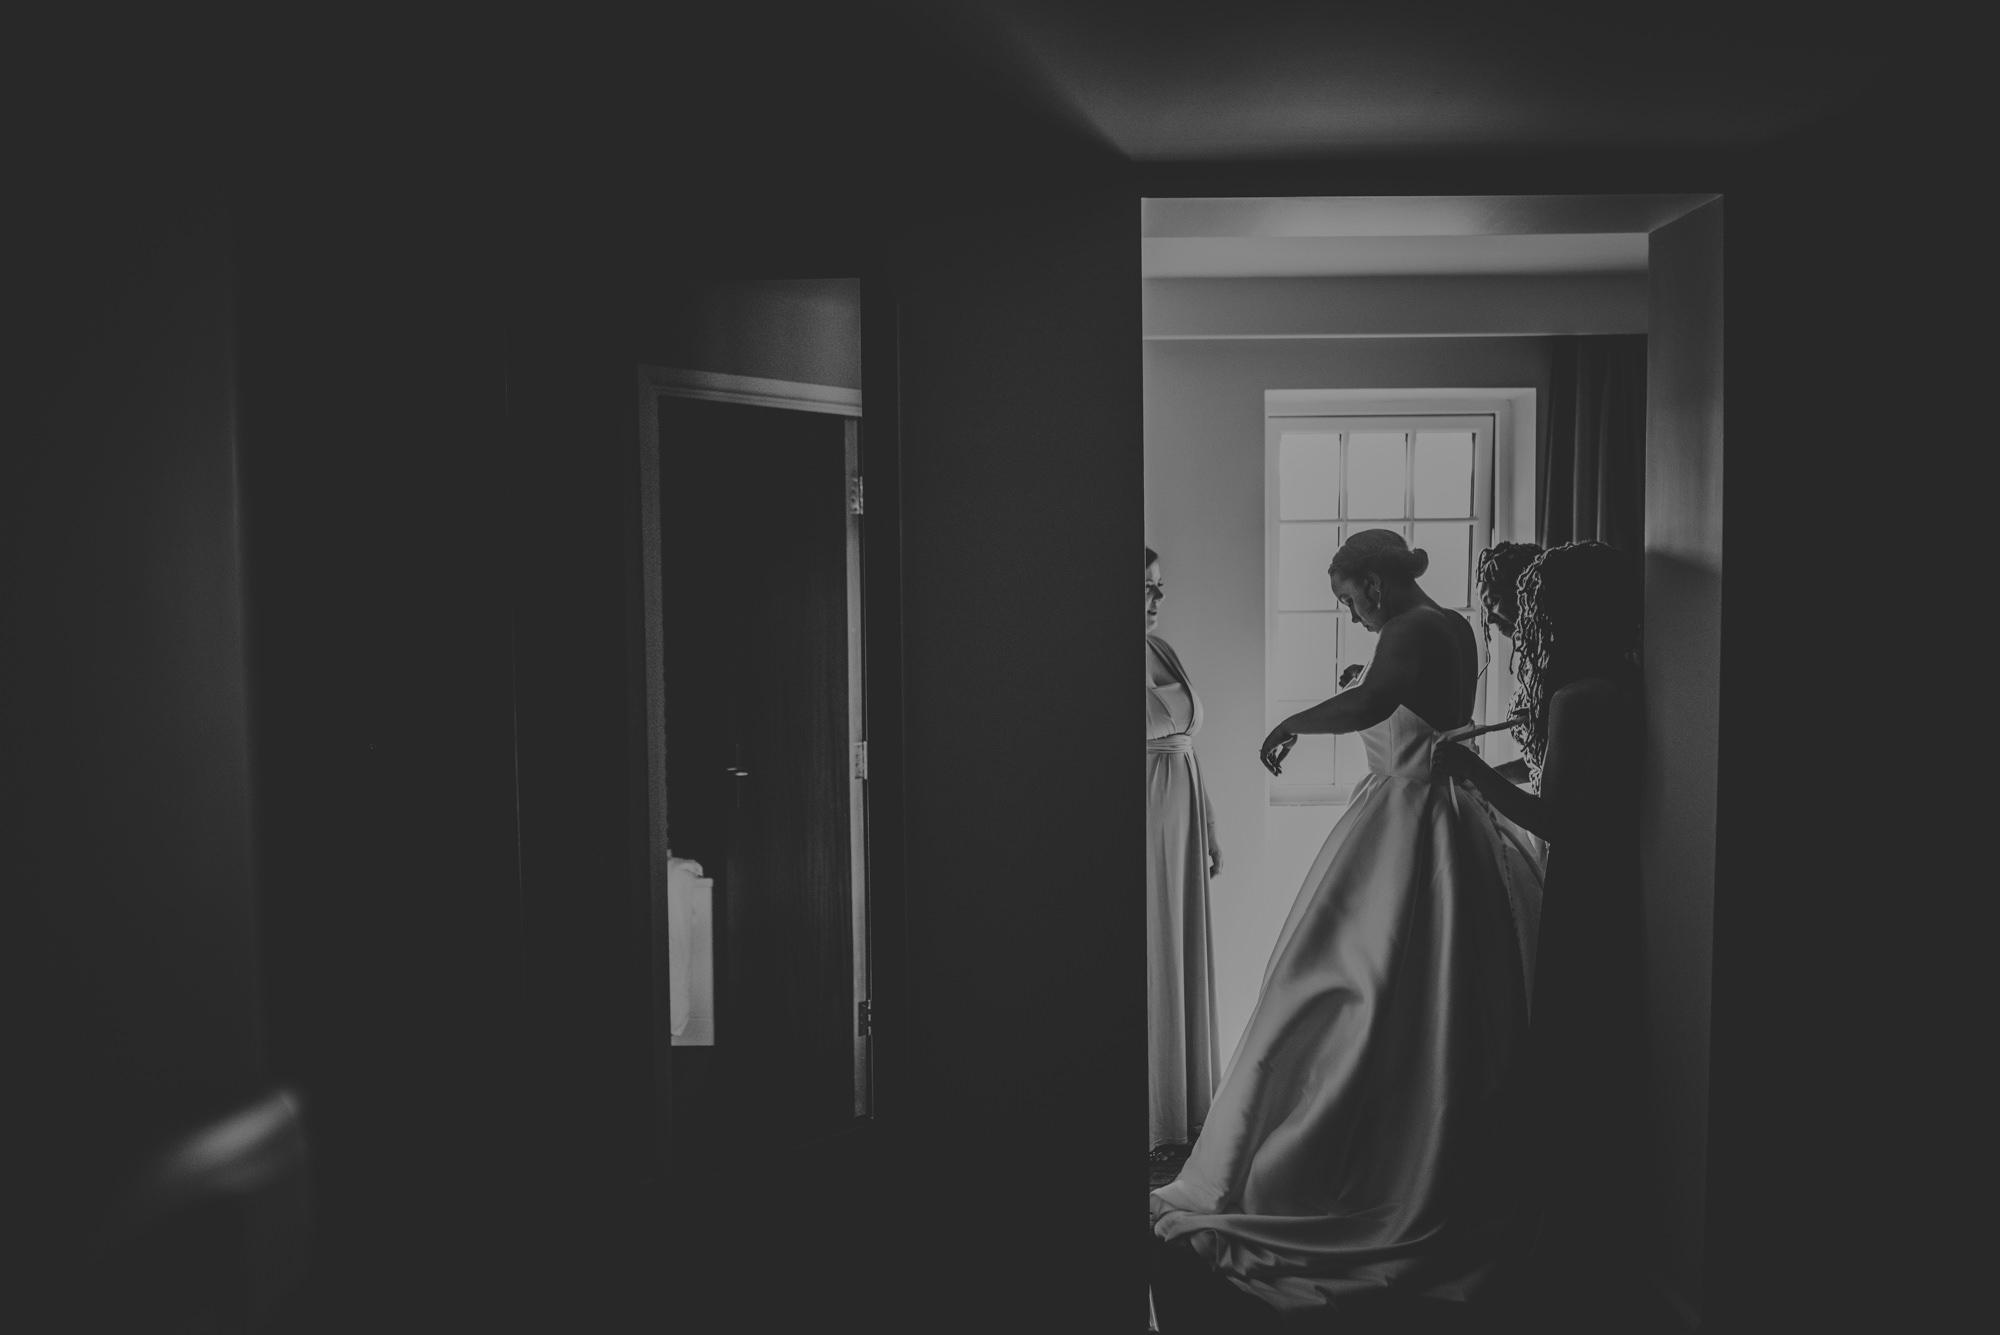 Jacqueline-Gareth-Wedding-Westmead-Events-Surrey-Manu-Mendoza-Wedding-Photography-122.jpg